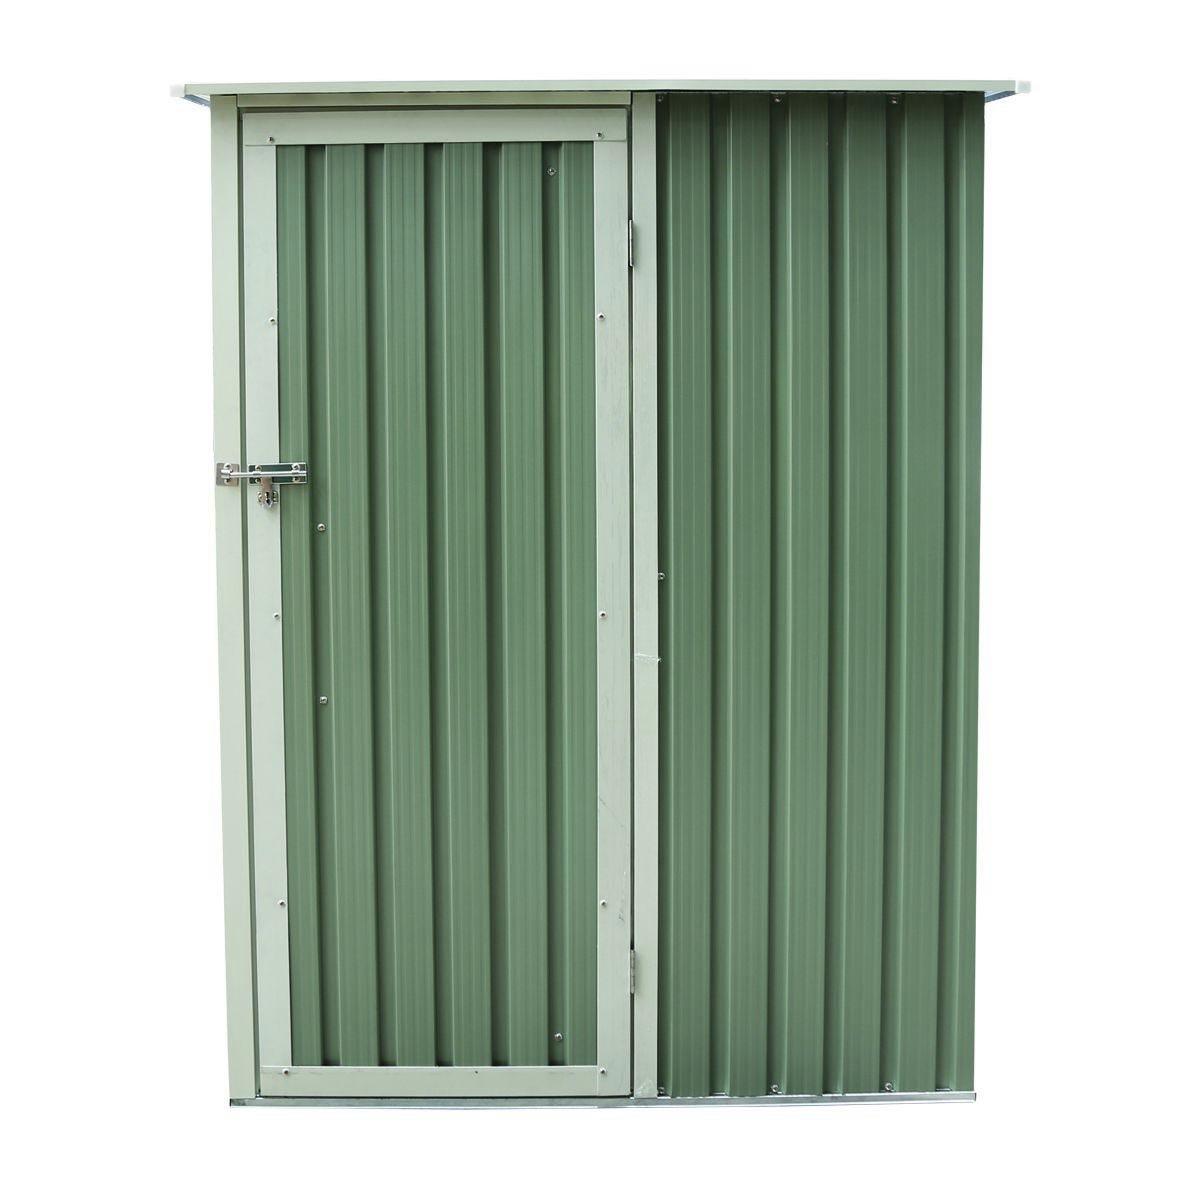 Charles Bentley Garden 4.7ft X 3ft Metal Storage Shed